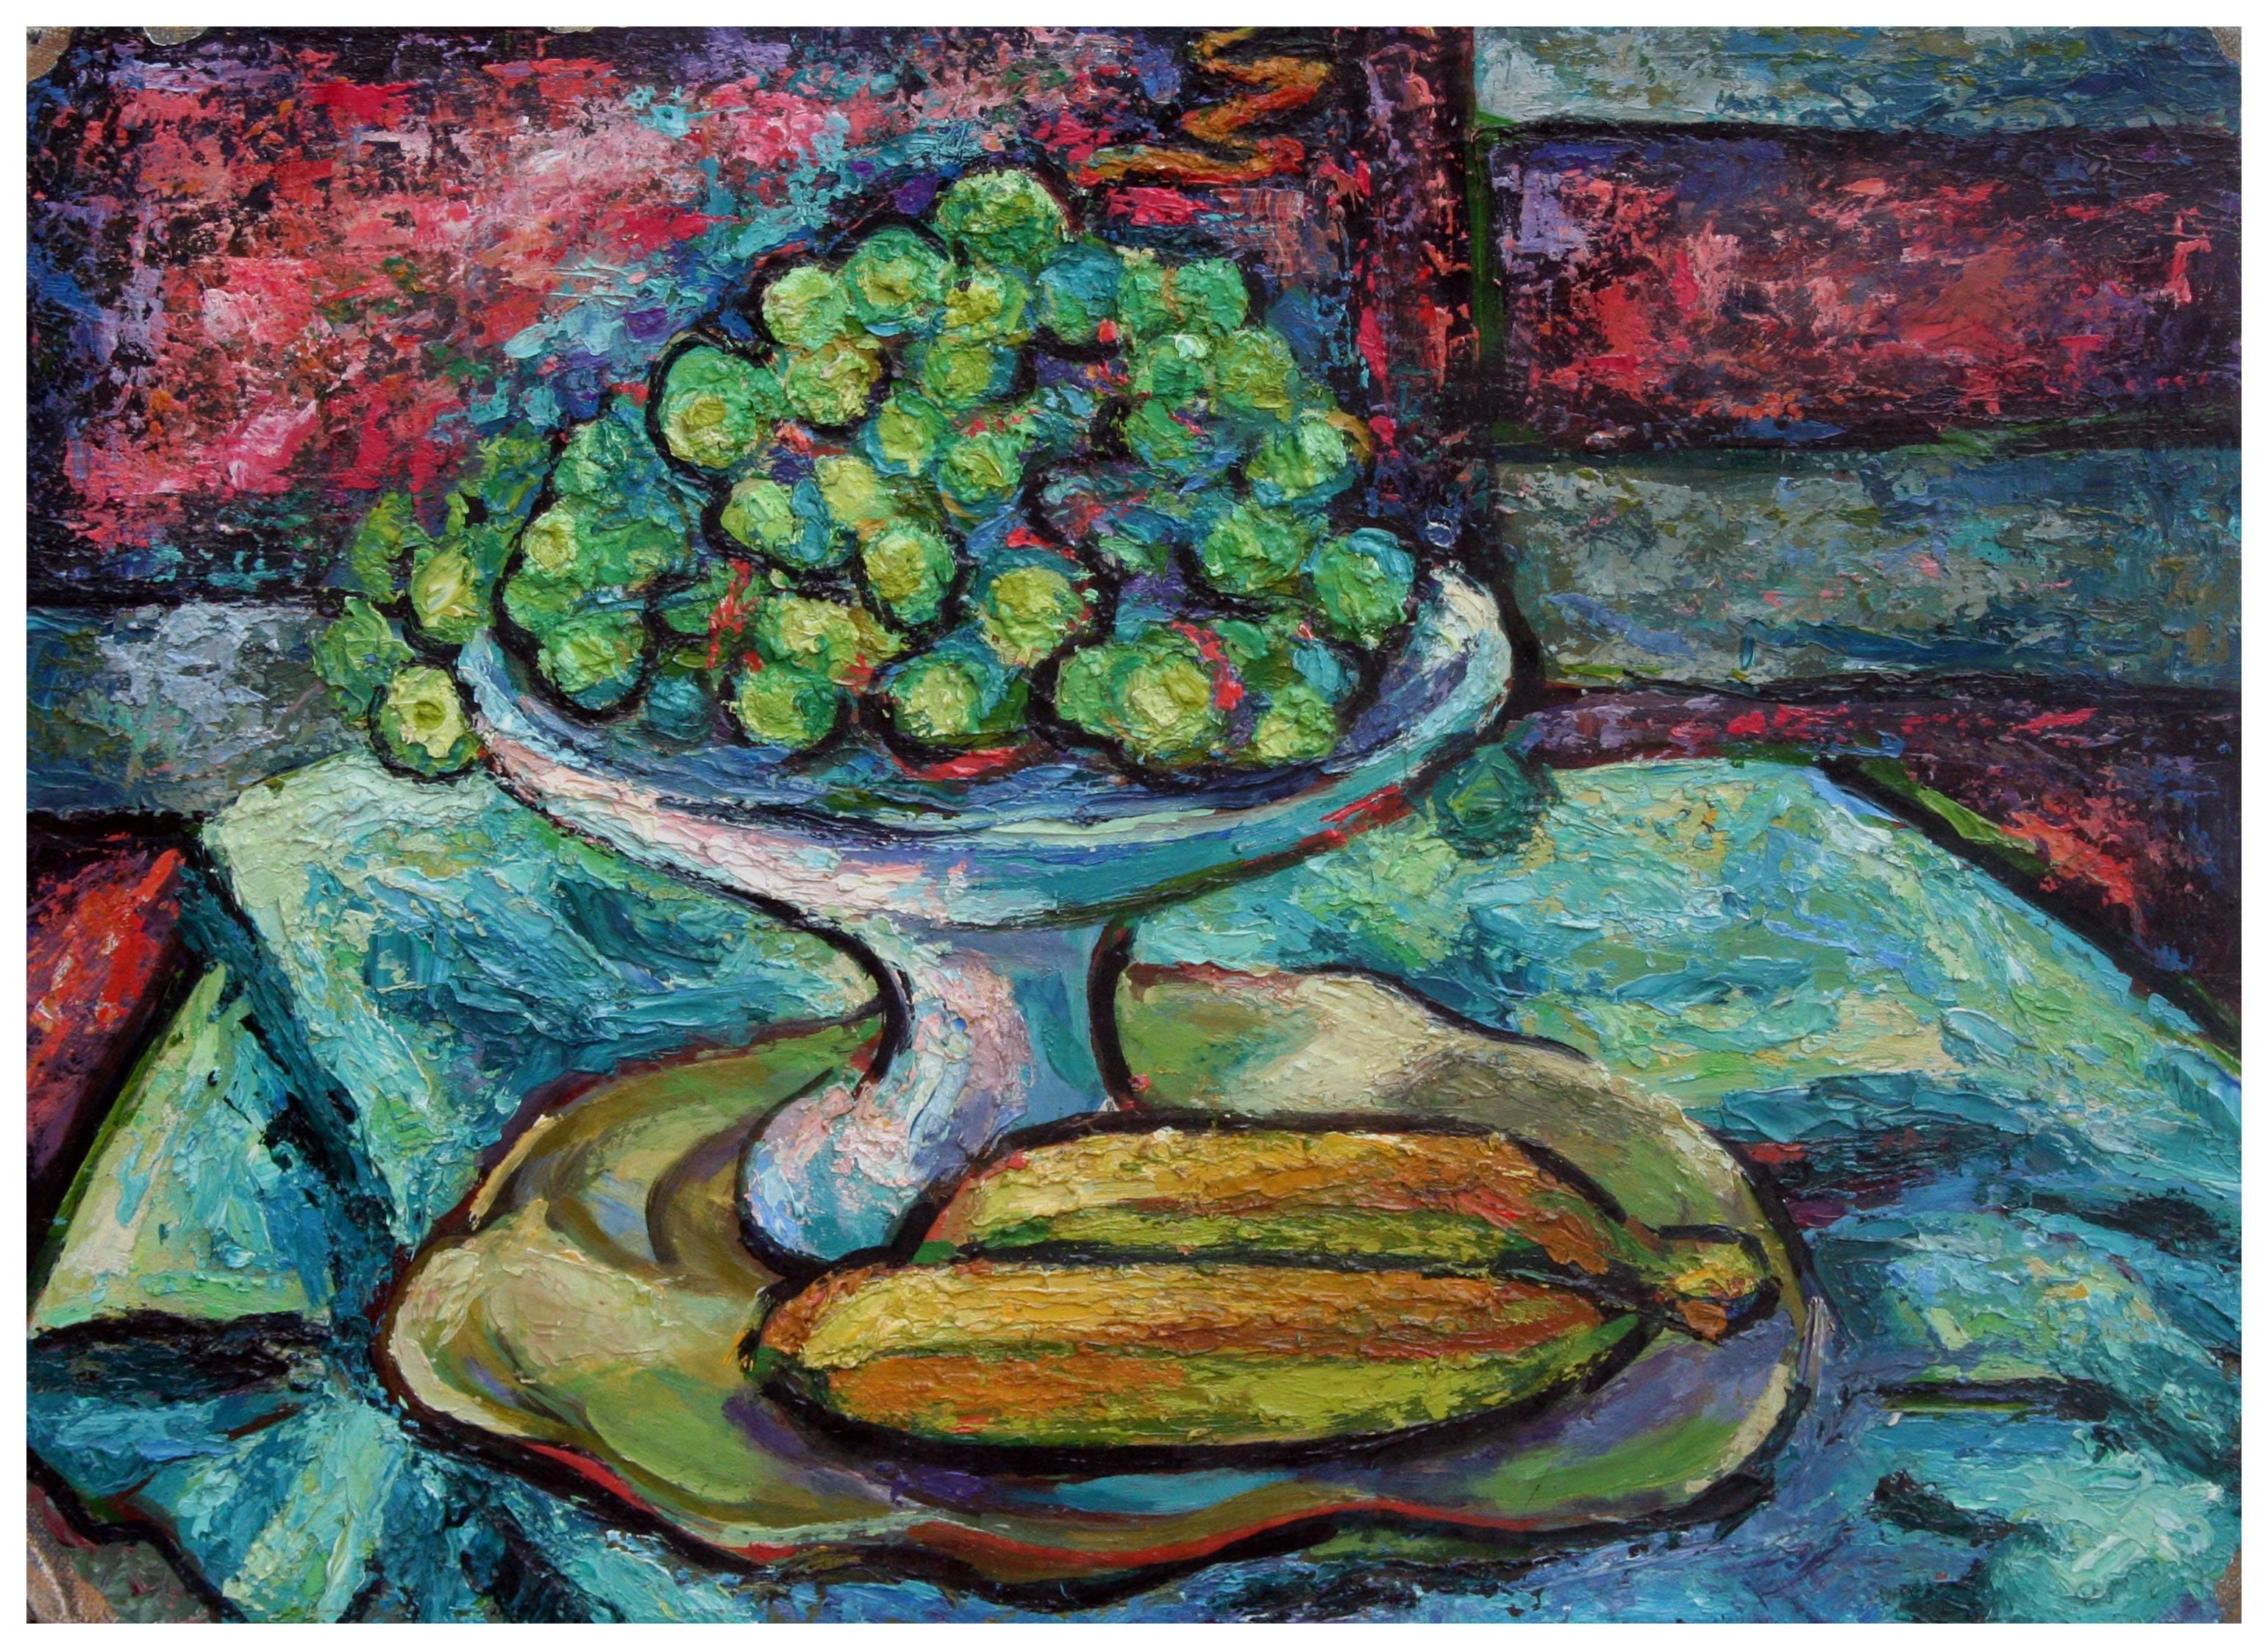 Mid Century Abstracted Grapes and Bananas Still Life